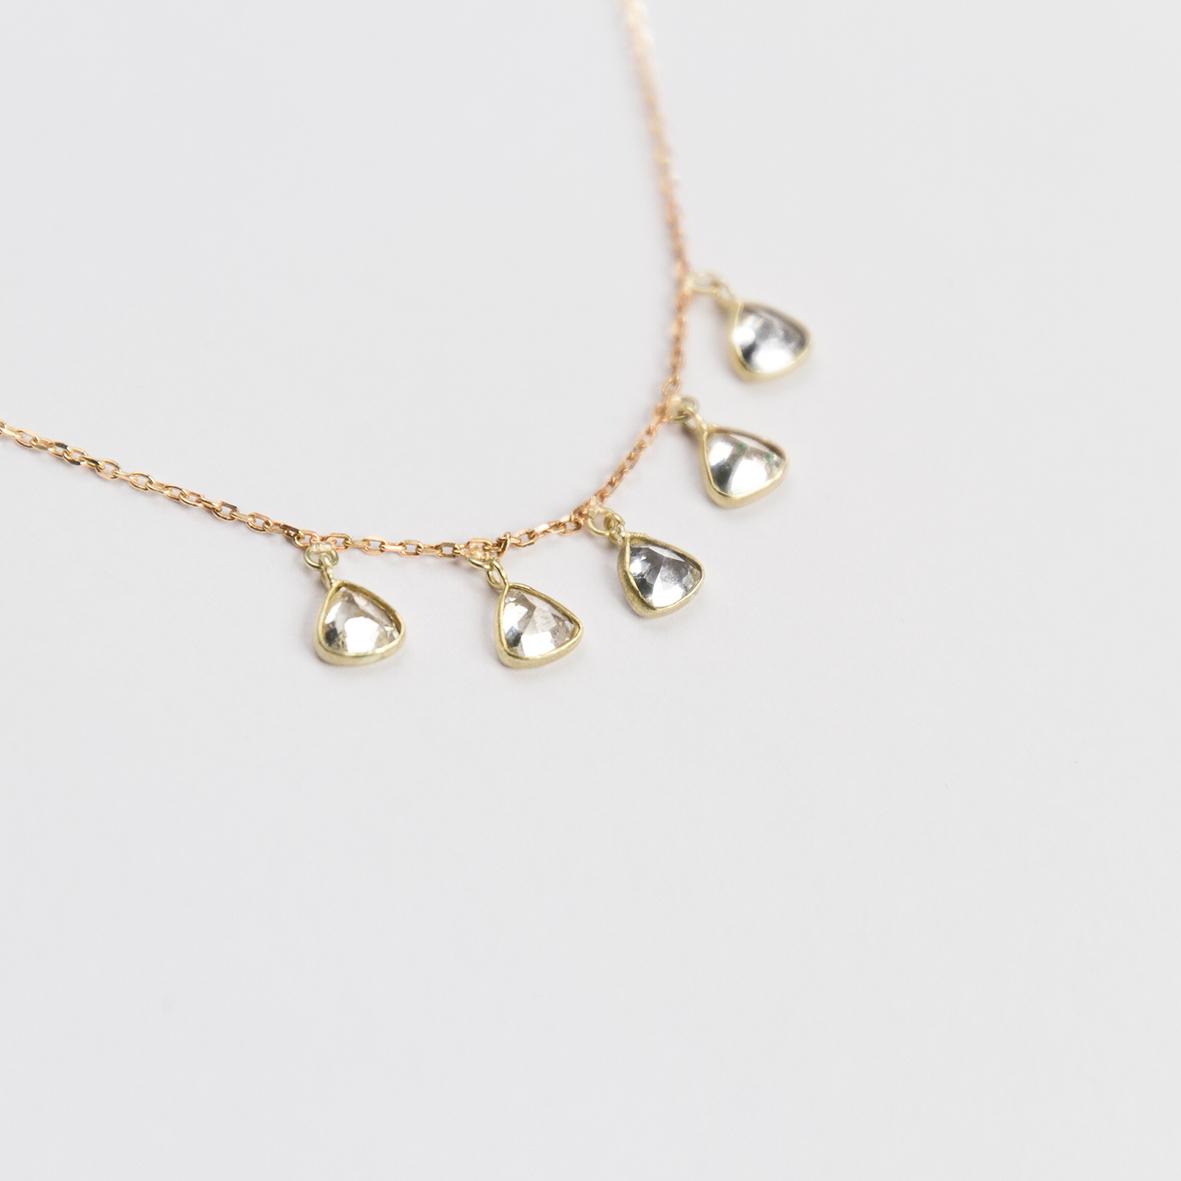 3. OONA_philo_principal_sapphire five triangles necklace